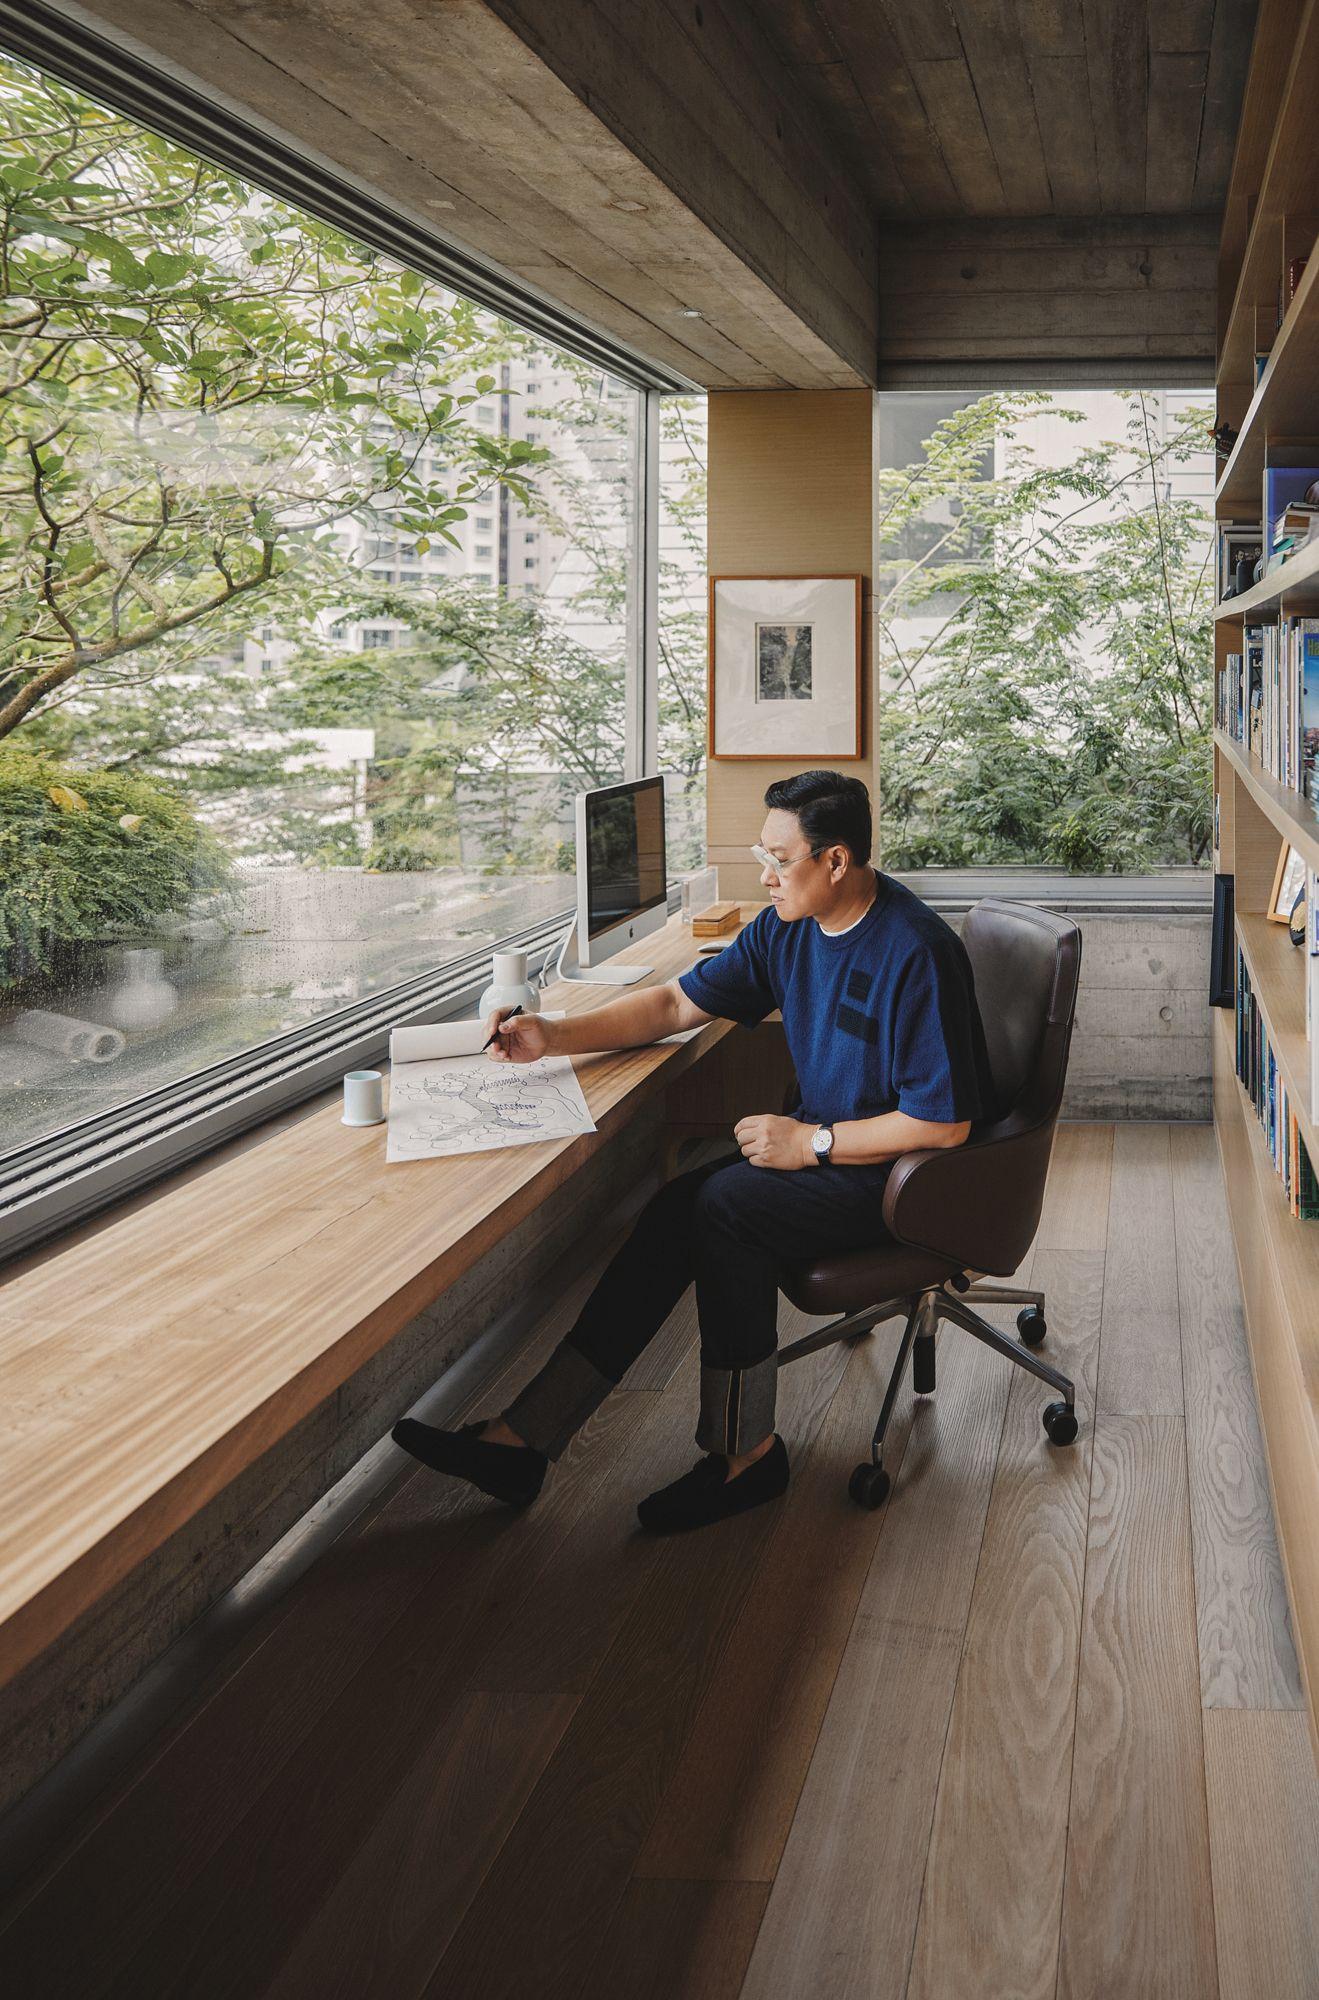 黃超文攝於書房,窗外是一片青青草地。黃超文腕錶by Piaget。(Photo: Darren Gabriel Leow for Tatler Hong Kong)